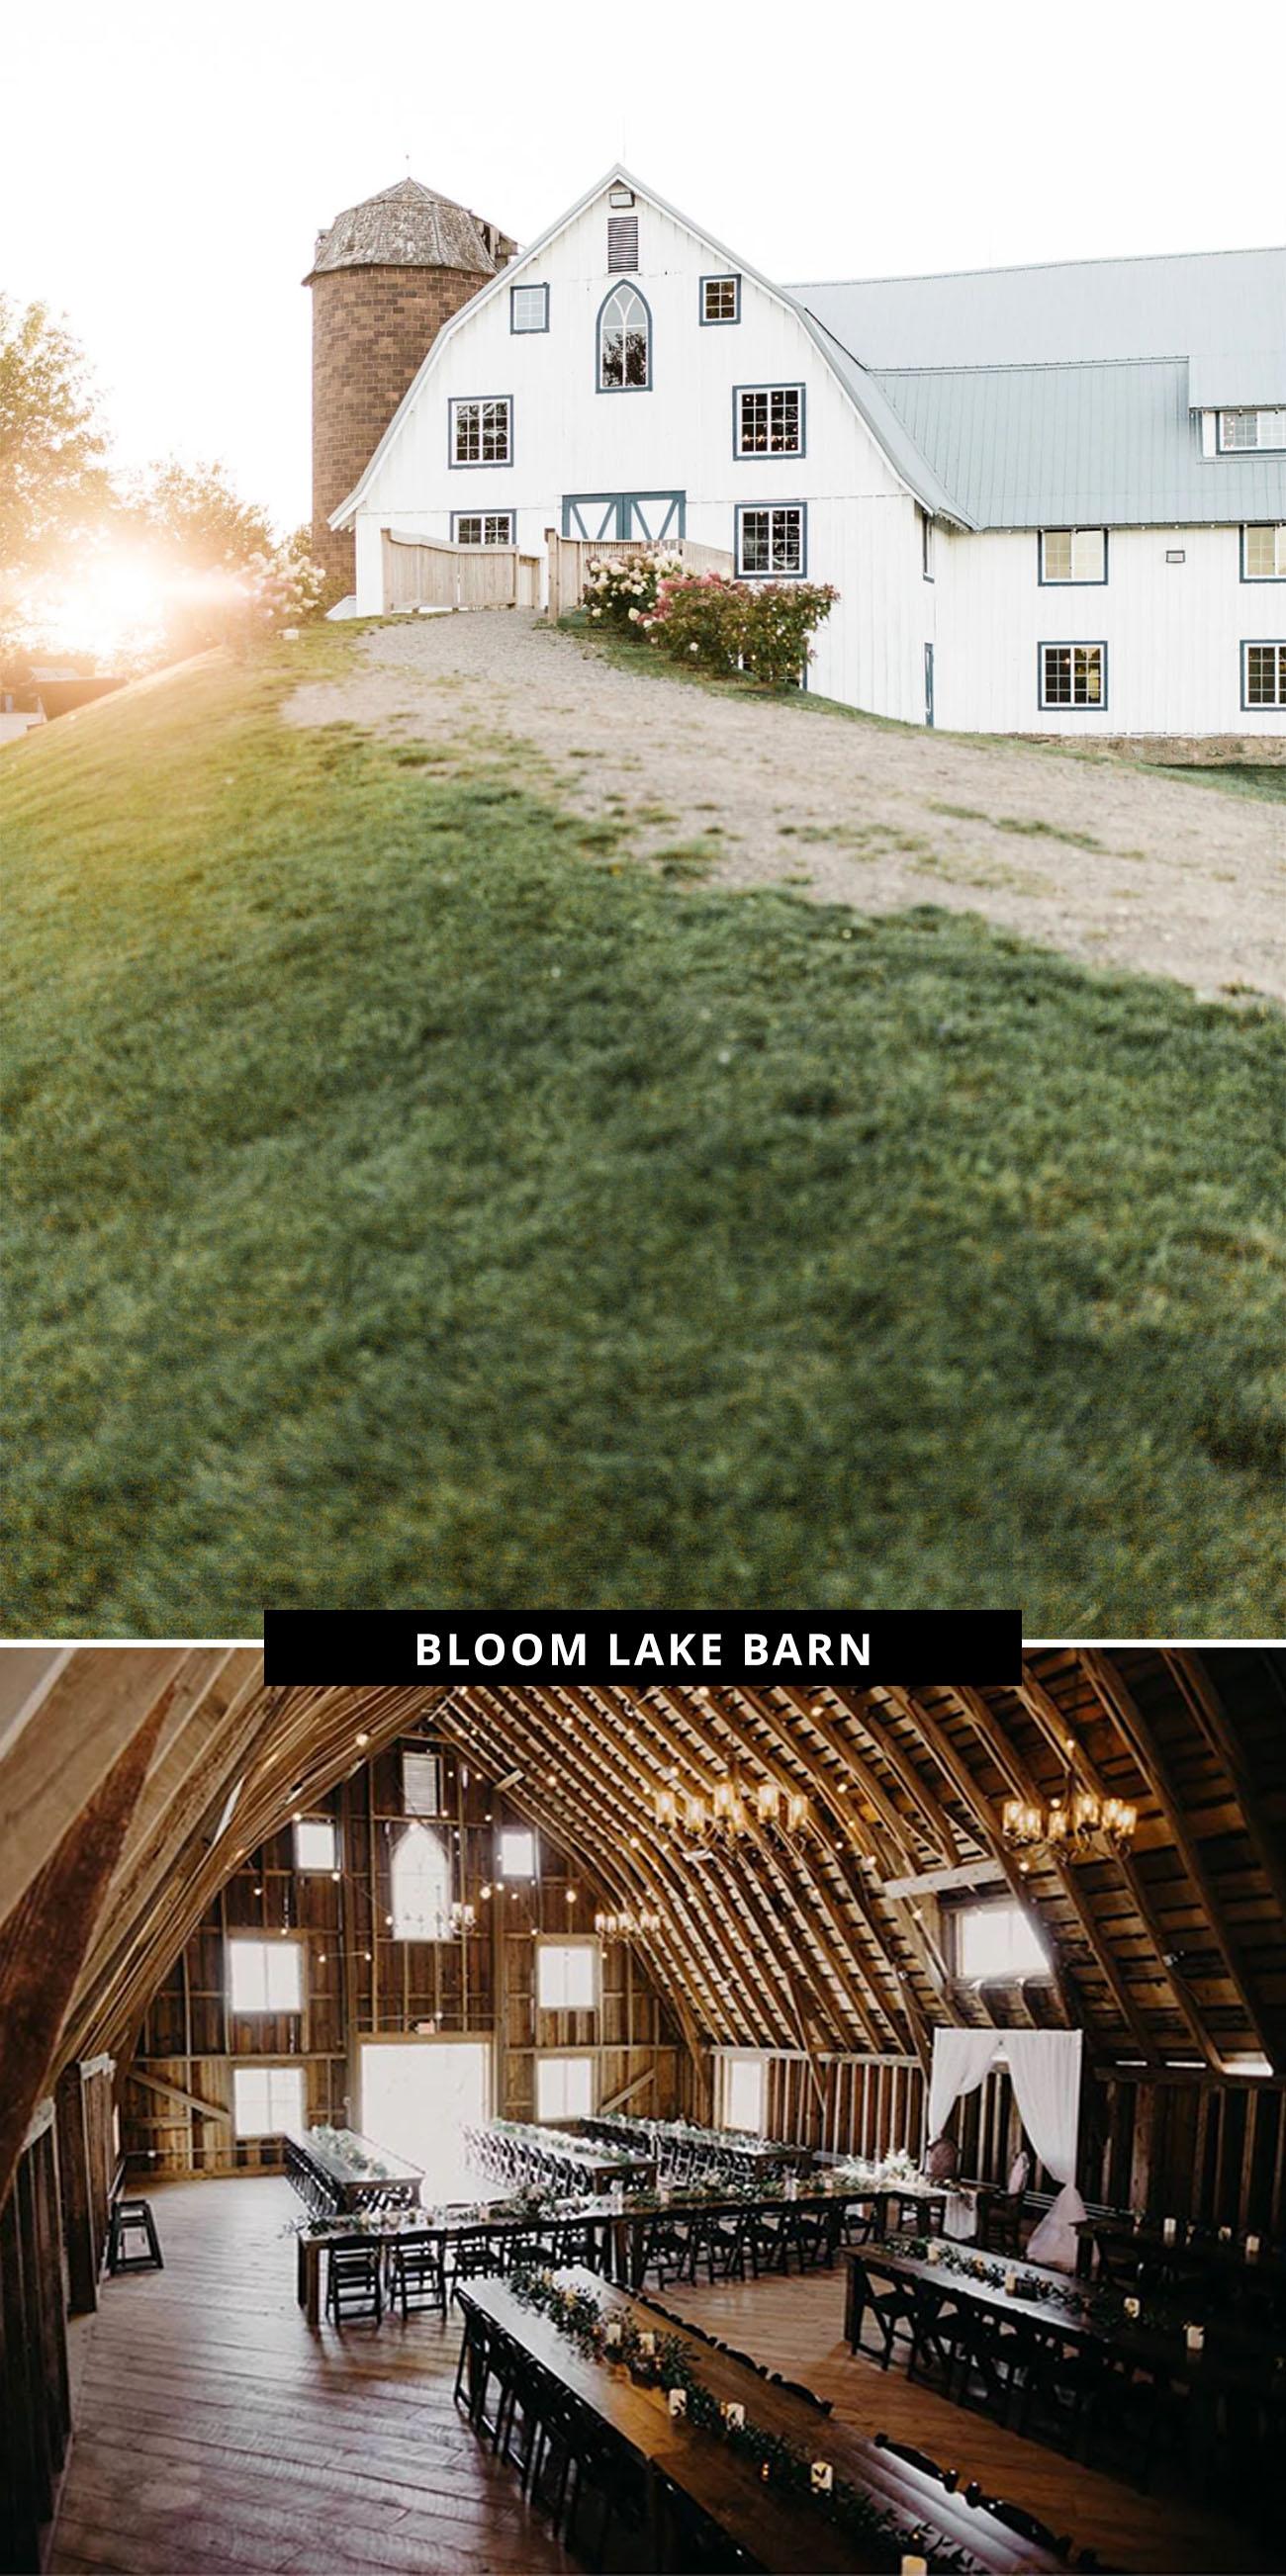 Bloom Lake Barn wedding venue